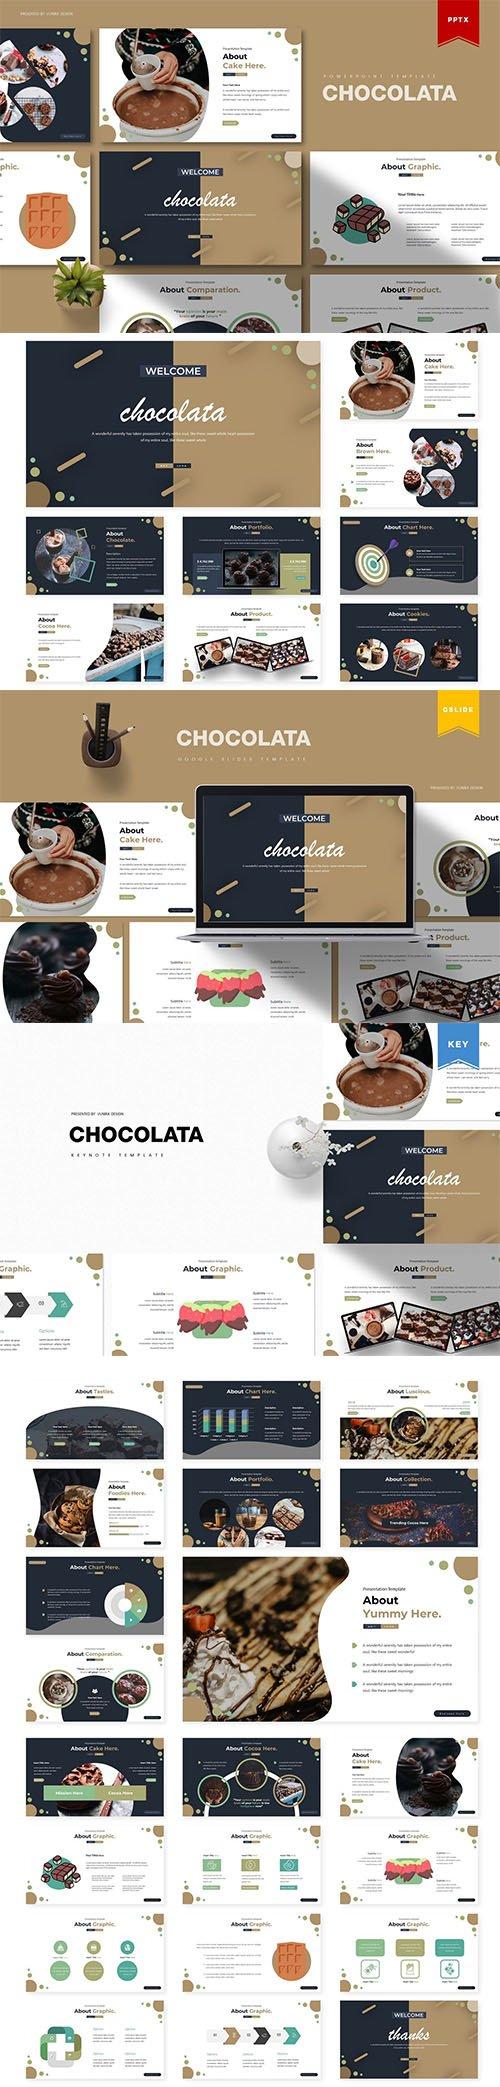 Chocolata - Powerpoint, Keynote and Google Slides Templates